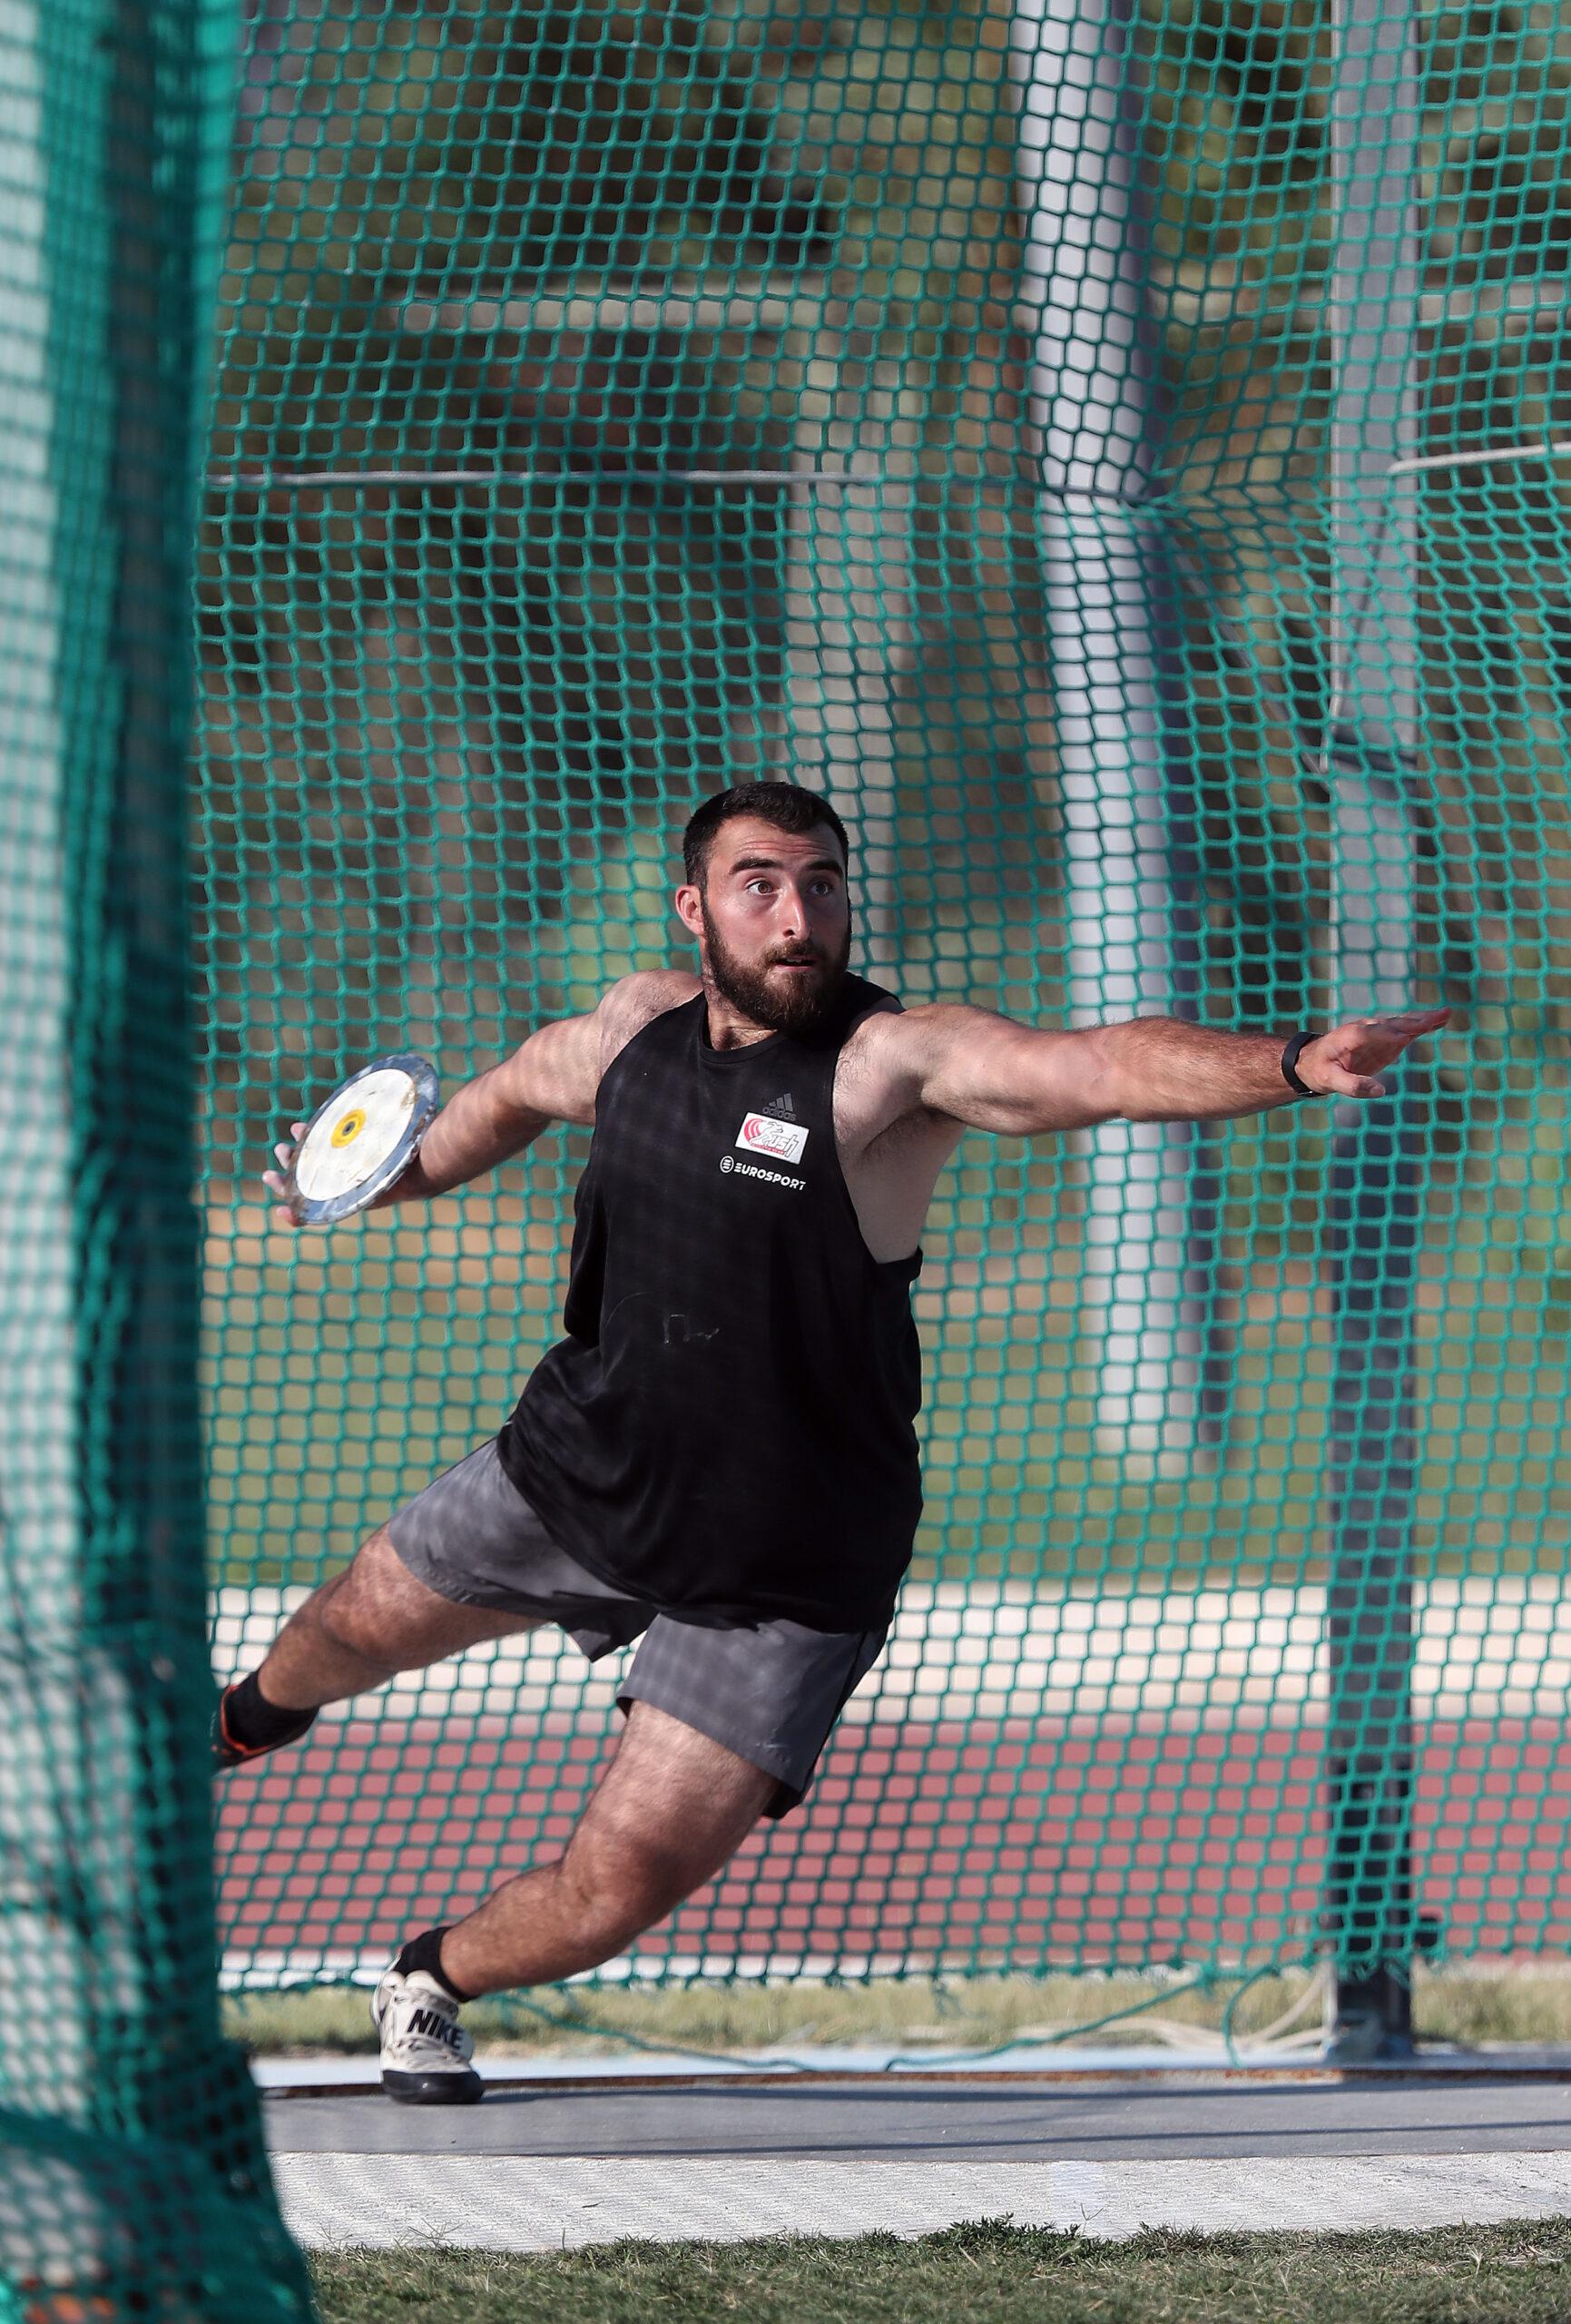 Luke Farrugia breaks own national record with 51.92m discus throw